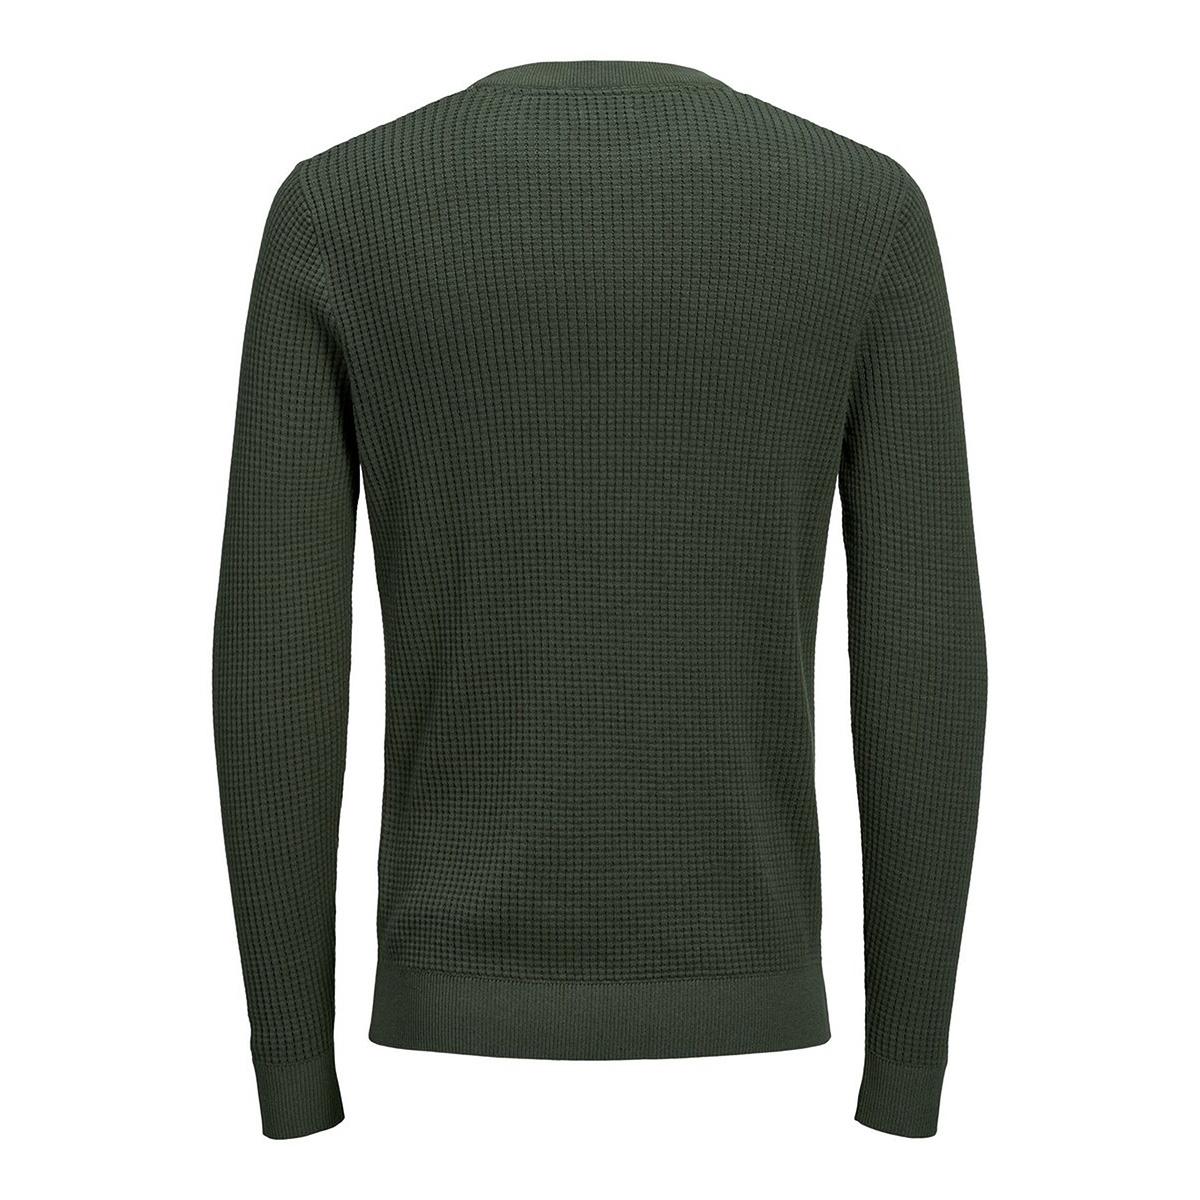 jprblake knit crew neck 12160921 jack & jones trui forest night